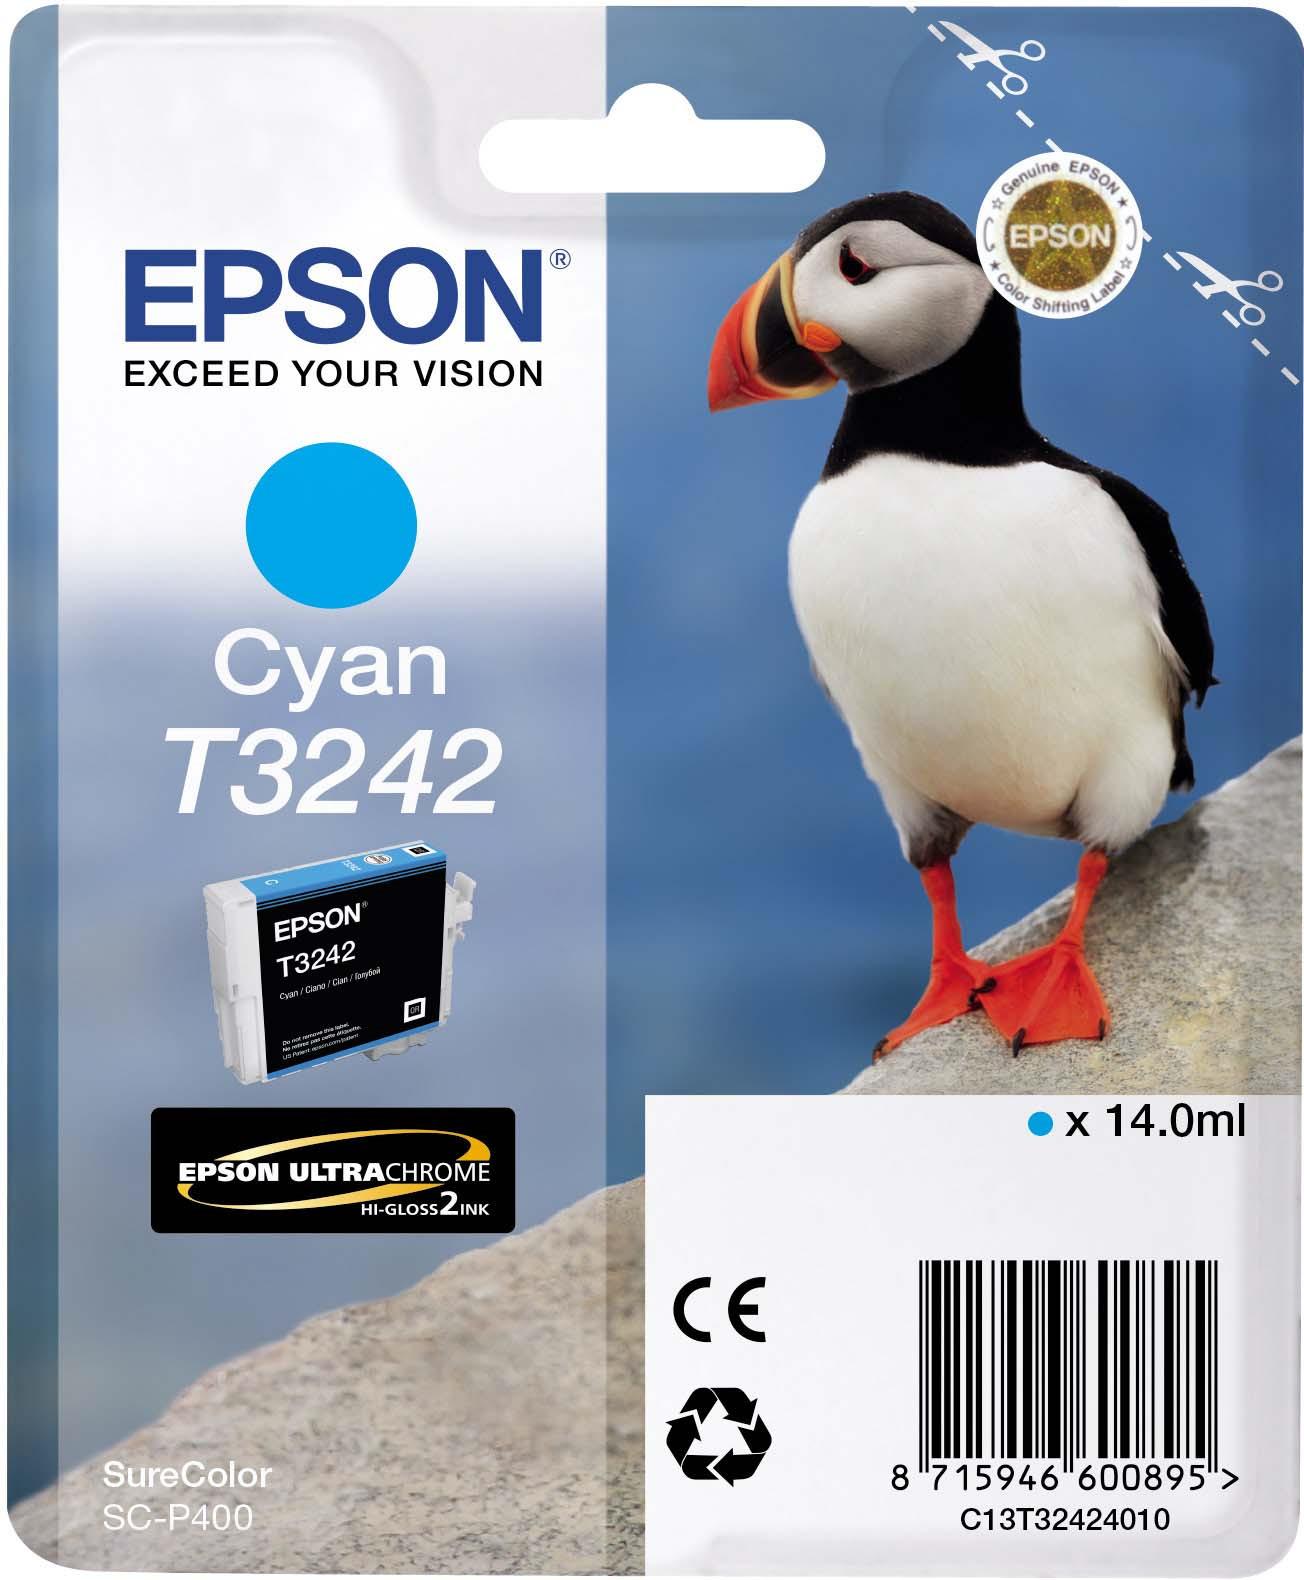 Картридж Epson C13T32424010 Cyan для принтеров Epson SC-P400, голубой